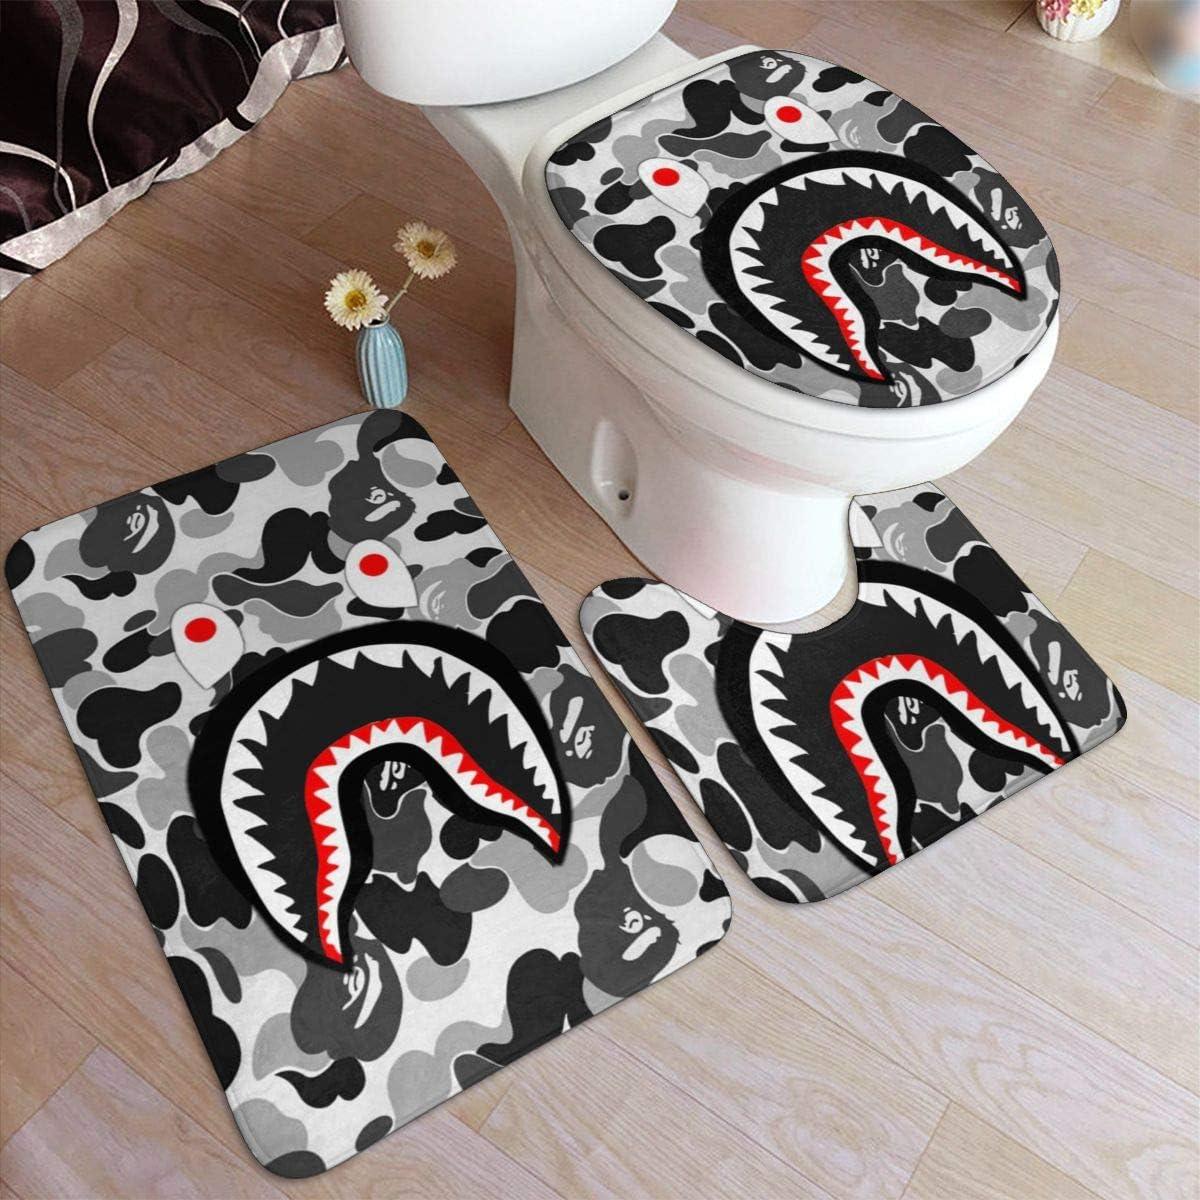 DISINIBITA Bath Mat Bape Blood Shark Bathroom Carpet Rug Non Slip 3 Piece Bathroom Mat Set